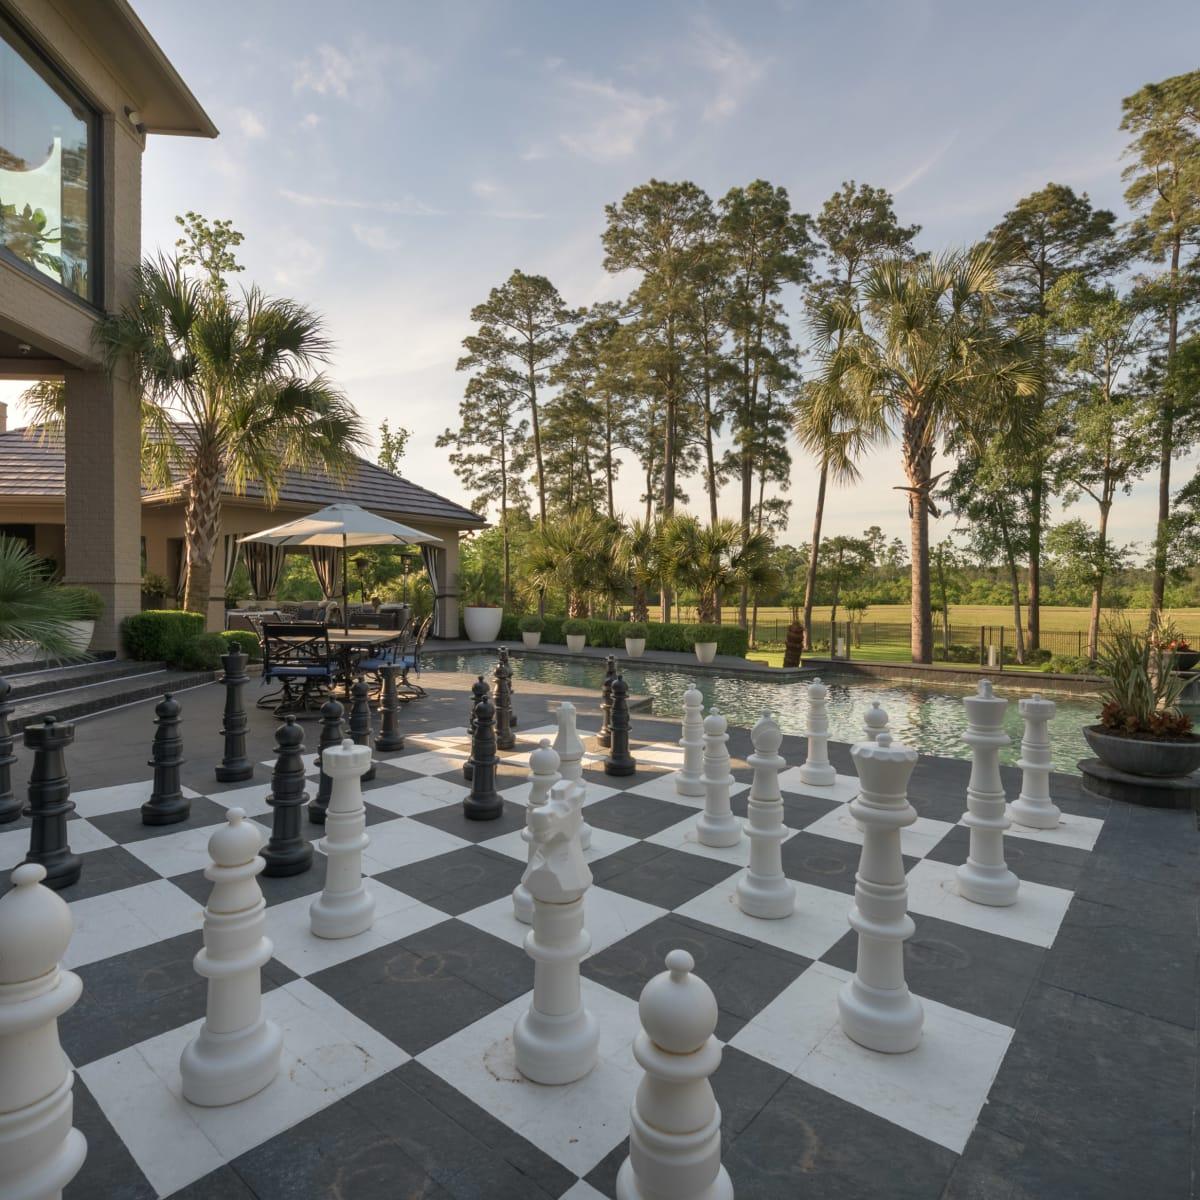 Woodlands three-story closet 47 Grand Circle exterior  chess pieces